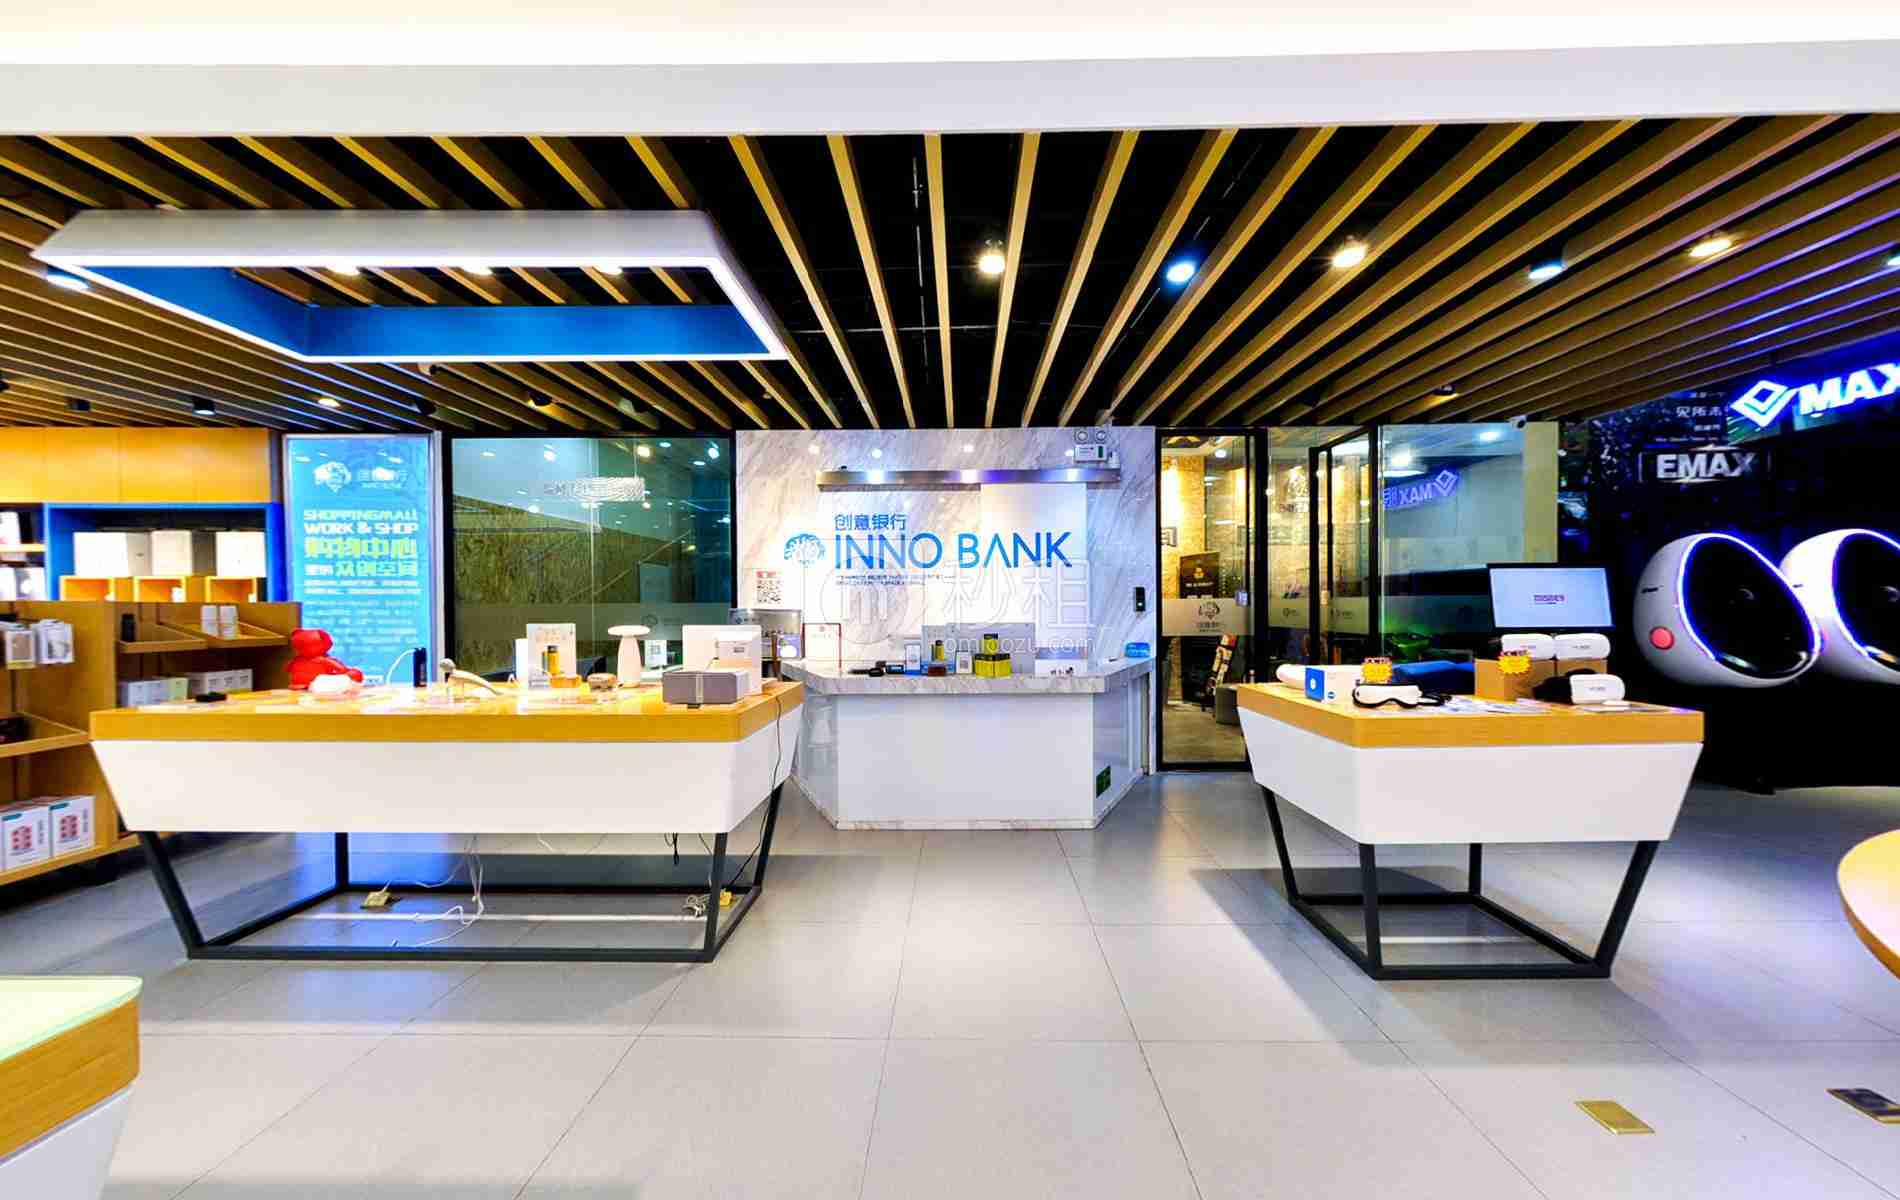 创意银行INNO BANK写字楼出租/招租/租赁,创意银行INNO BANK办公室出租/招租/租赁